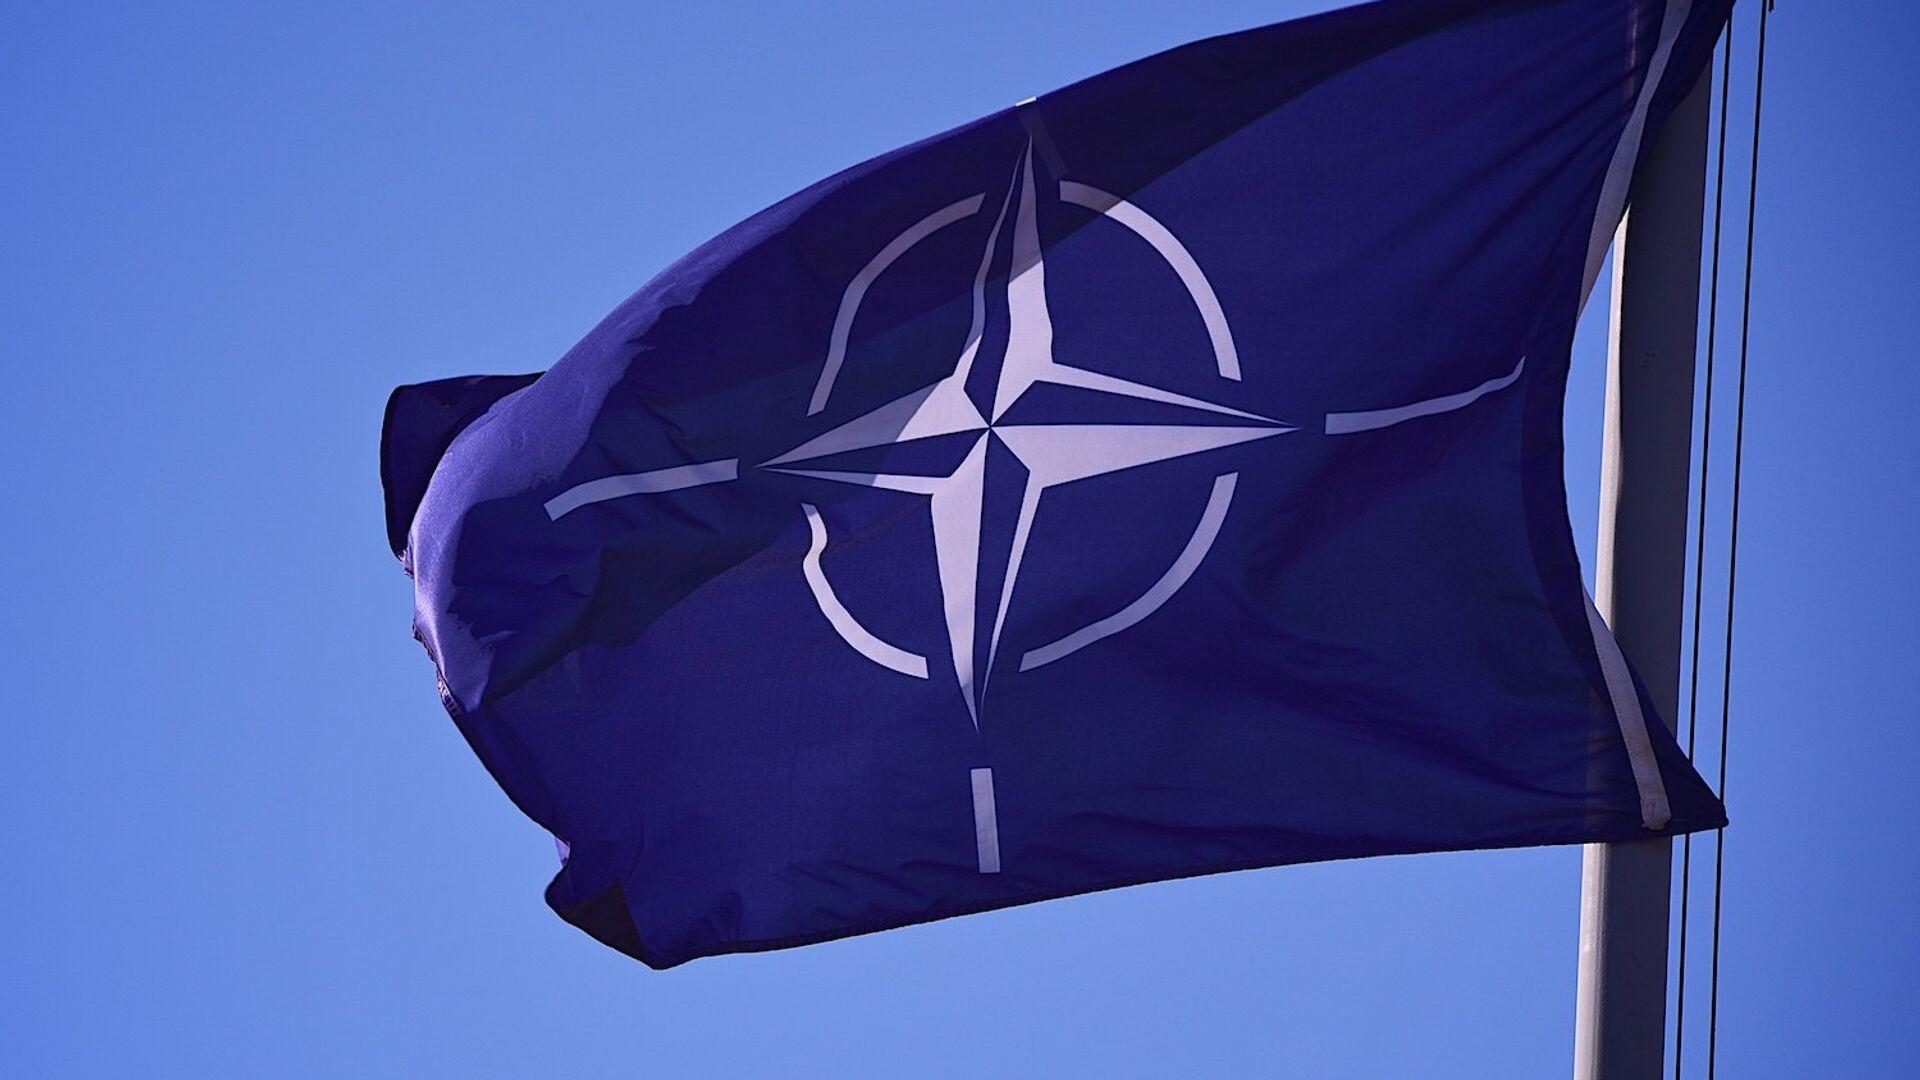 Флаг НАТО на территории учебного центра JTEC на военной базе в Крцаниси - Sputnik Грузия, 1920, 10.06.2021